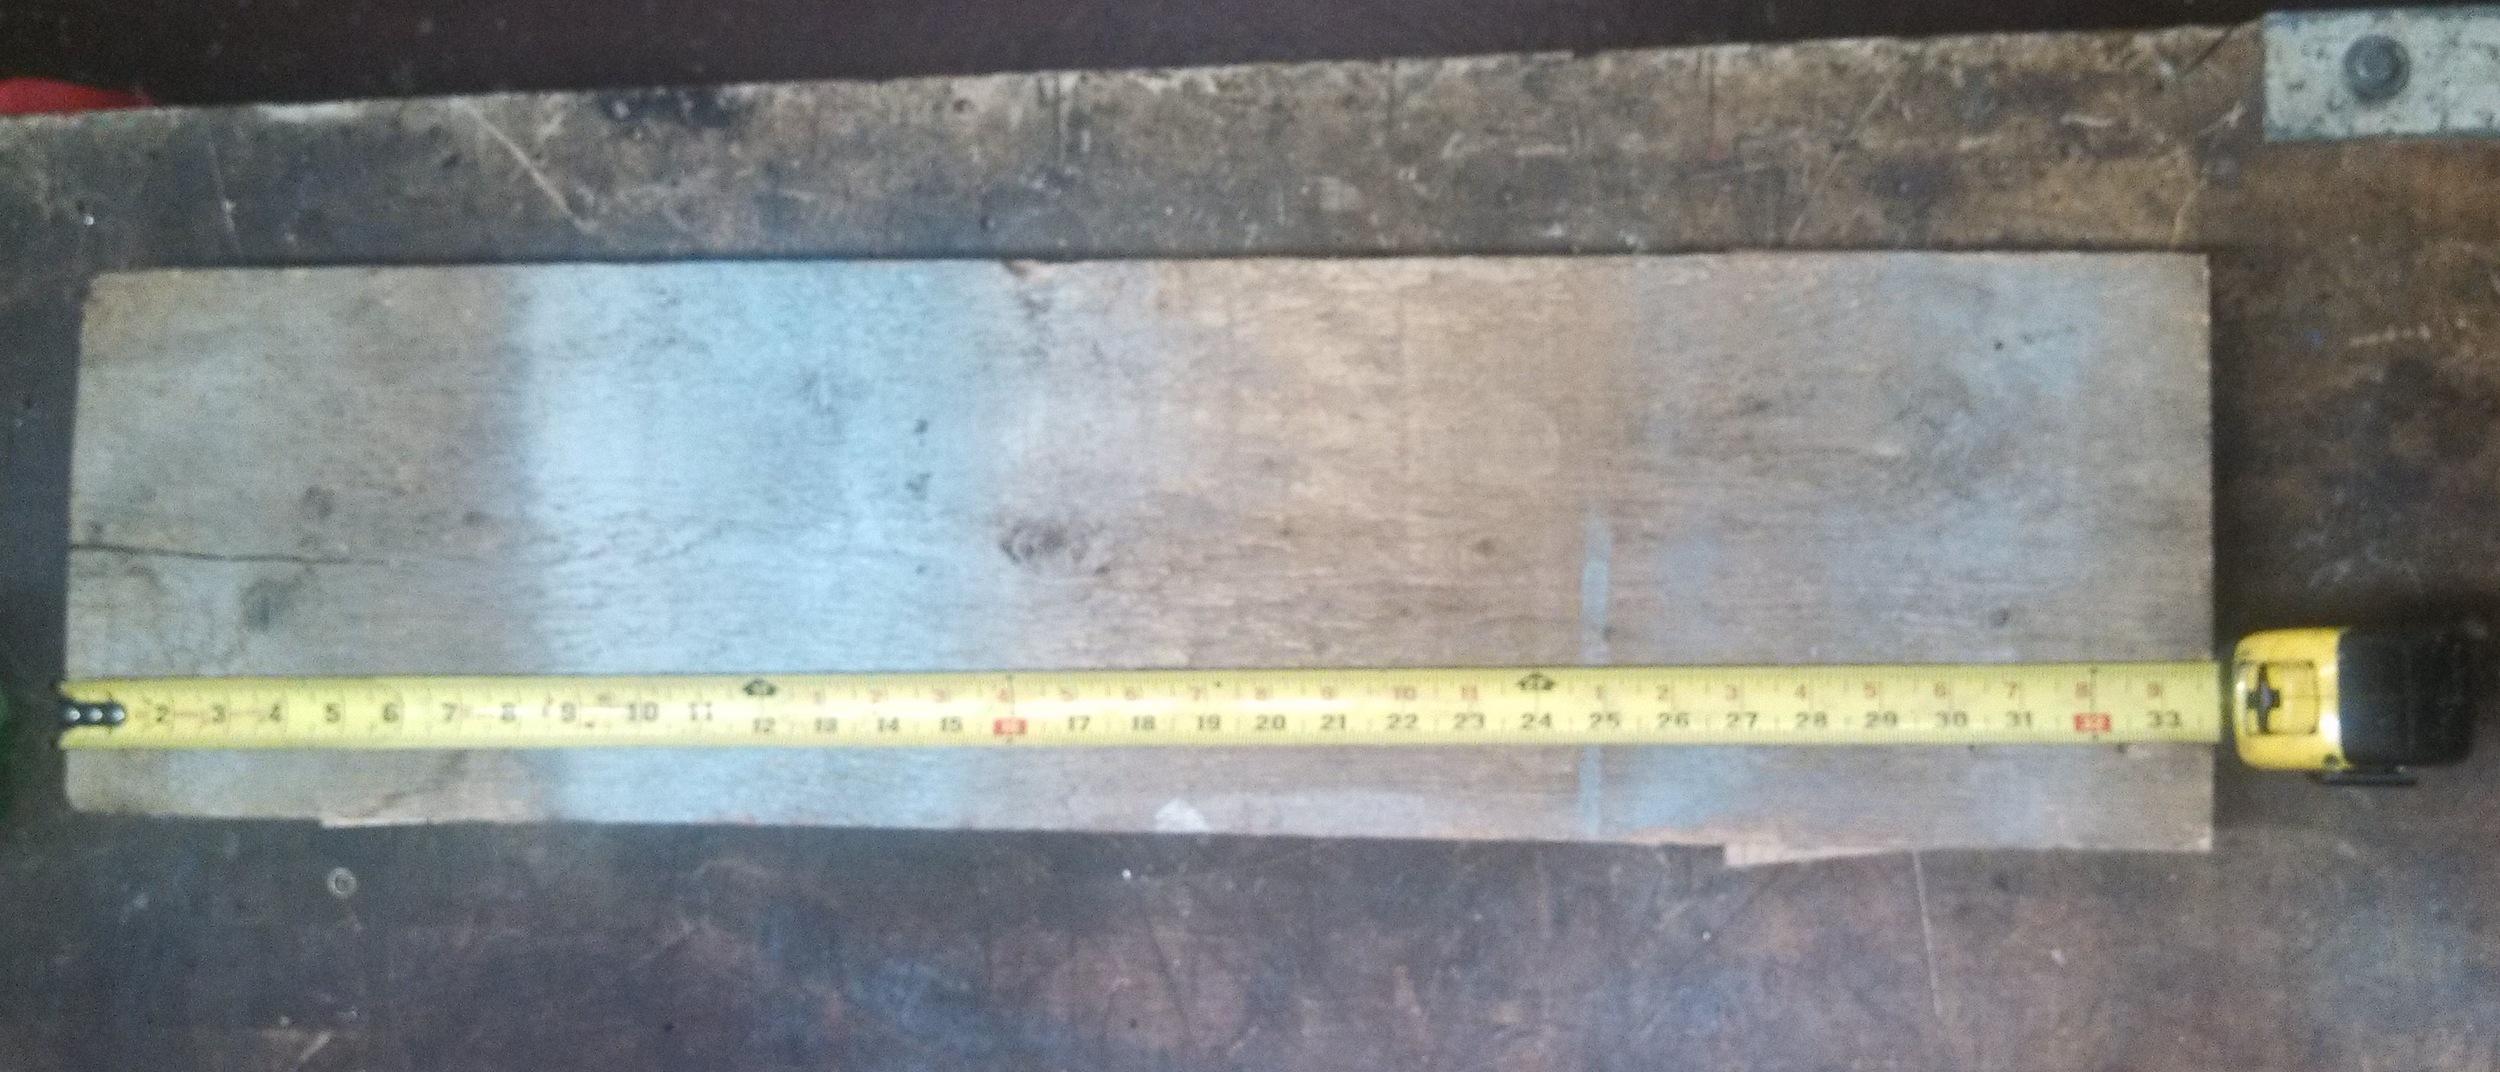 Simple Diy Wooden Balance Board In 4 Steps Balance